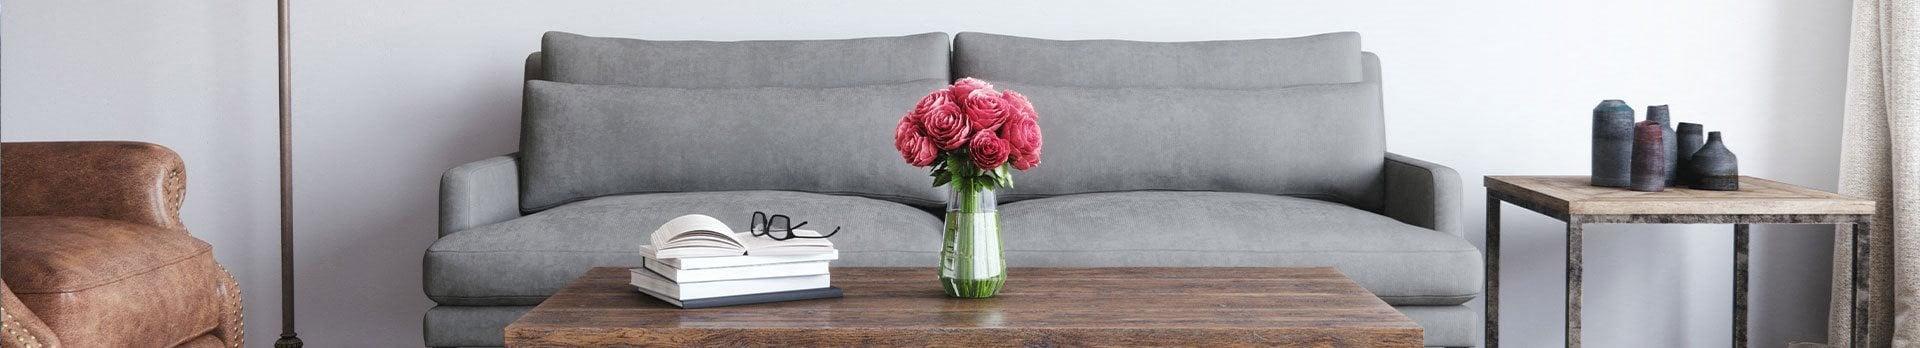 Comfy Sofa at Ashley Village Apartments, Ohio, 43232